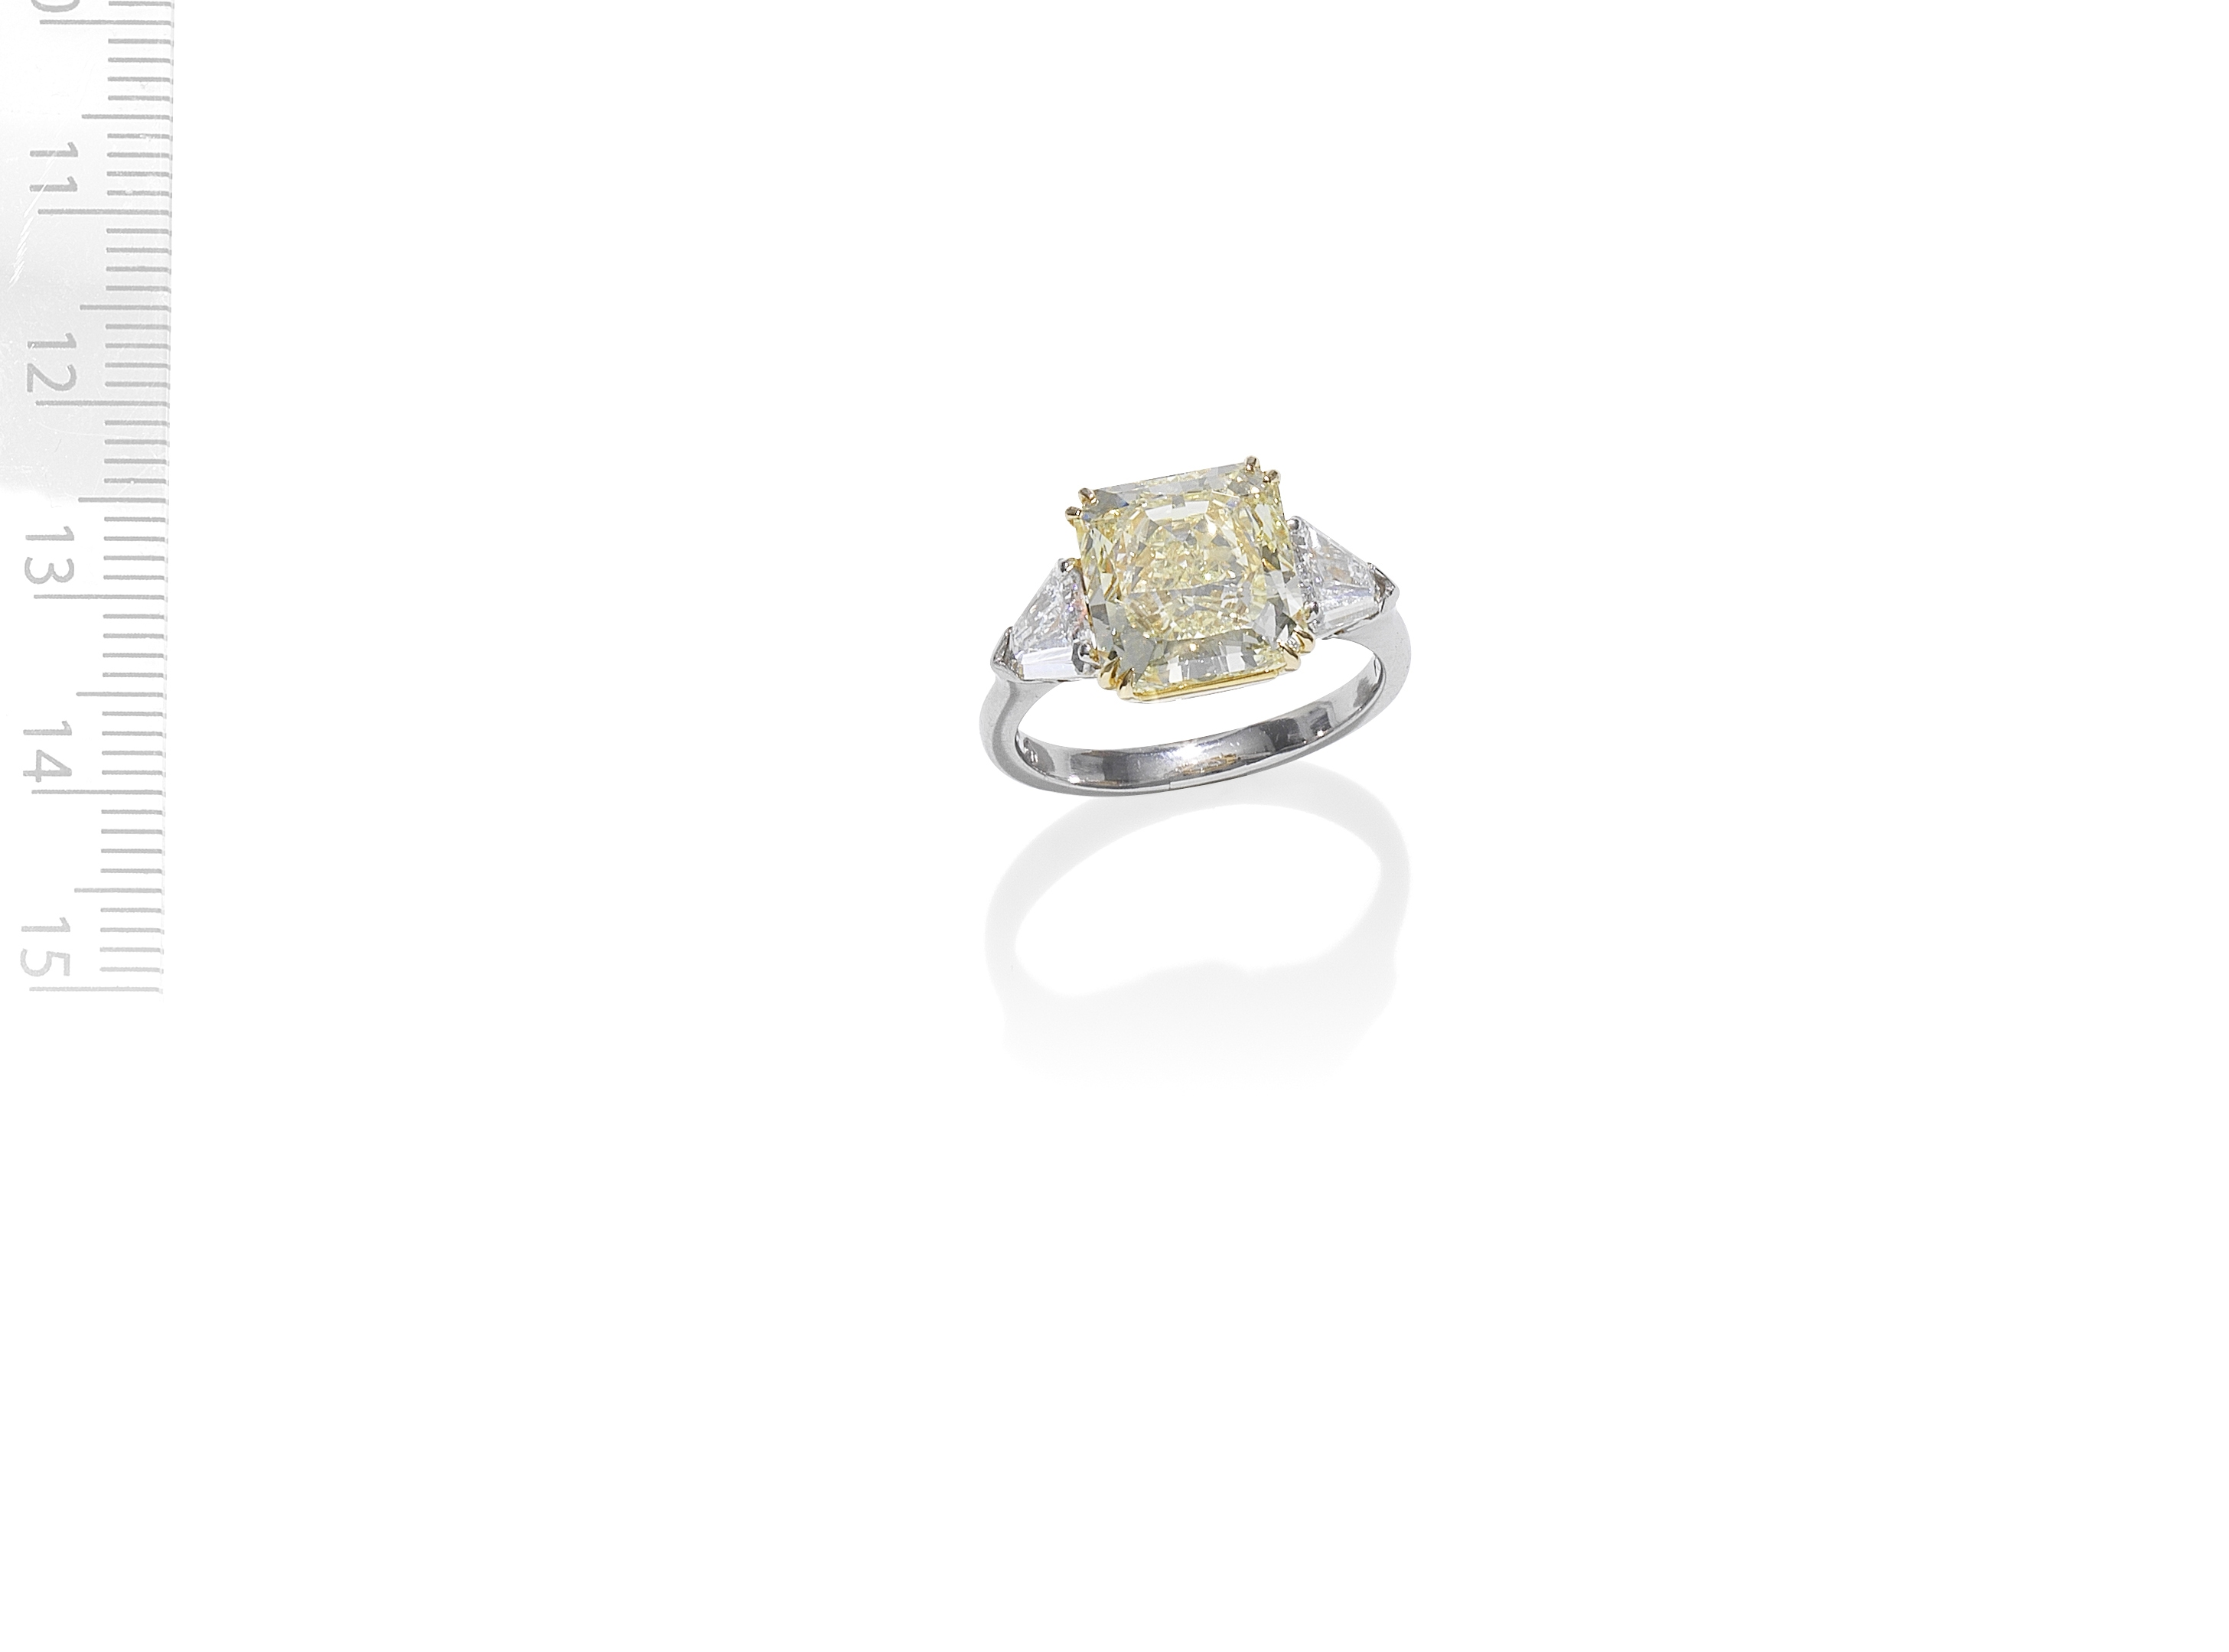 FANCY-COLOURED DIAMOND SINGLE-STONE RING